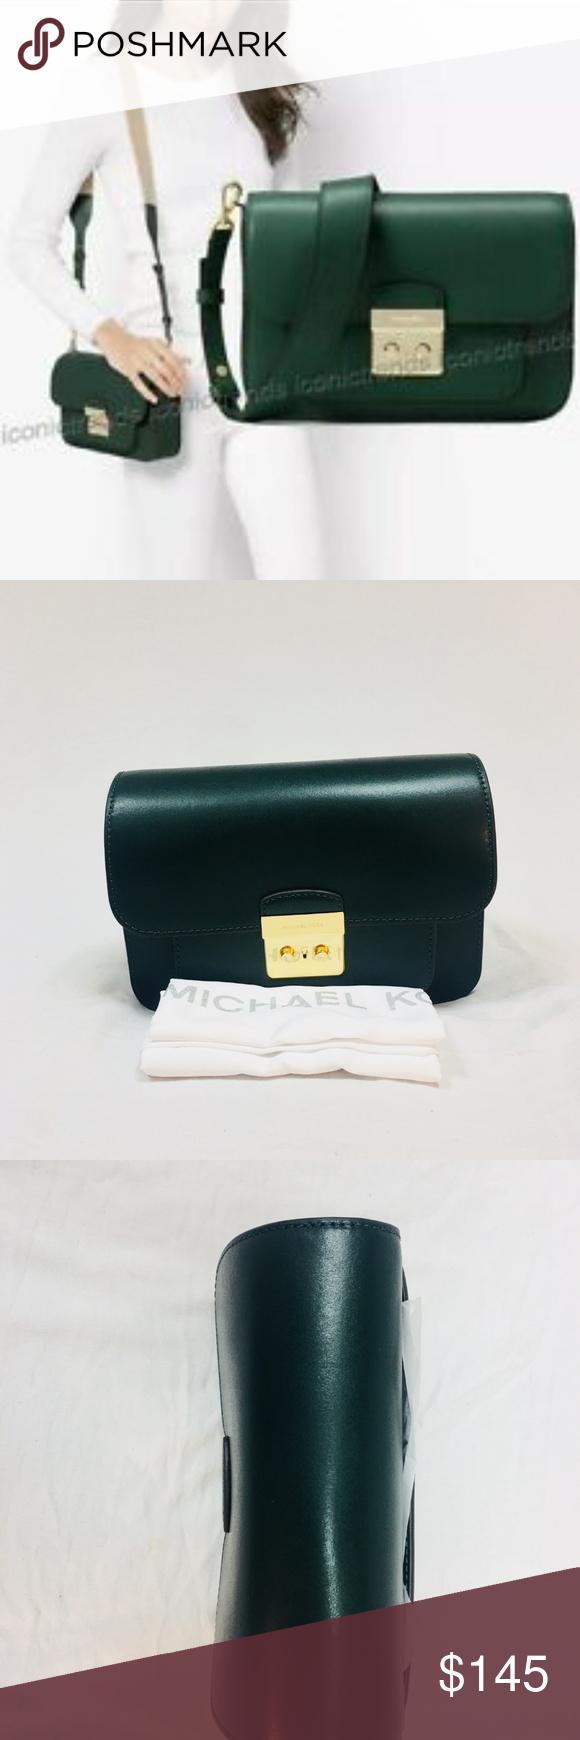 7aab90e3fb02 Michael Kors Large Sloan Editor Leather Green NWT Michael Kors Large Sloan  Editor Leather Shoulder Bag